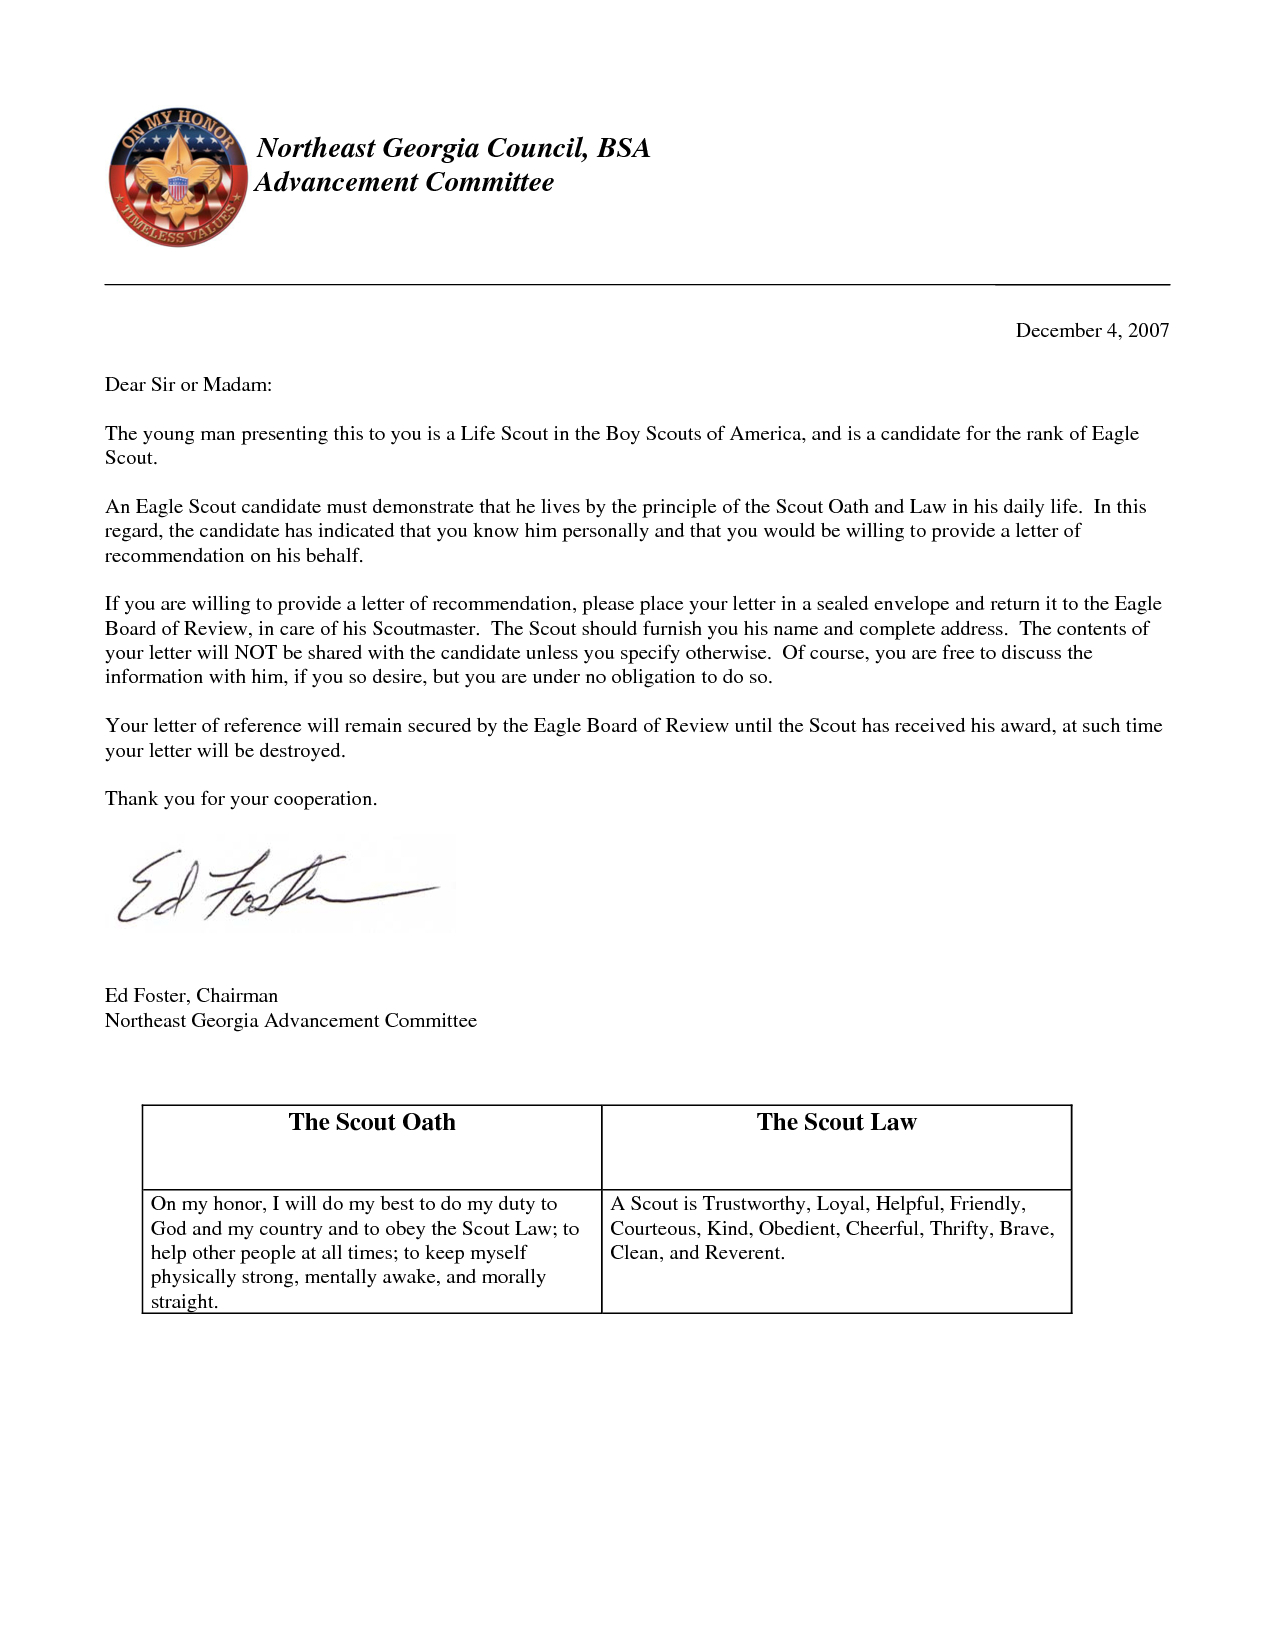 Eagle Scout Recommendation Letter Template - Eagle Scout Candidate Letter Of Re Mendation Acurnamedia